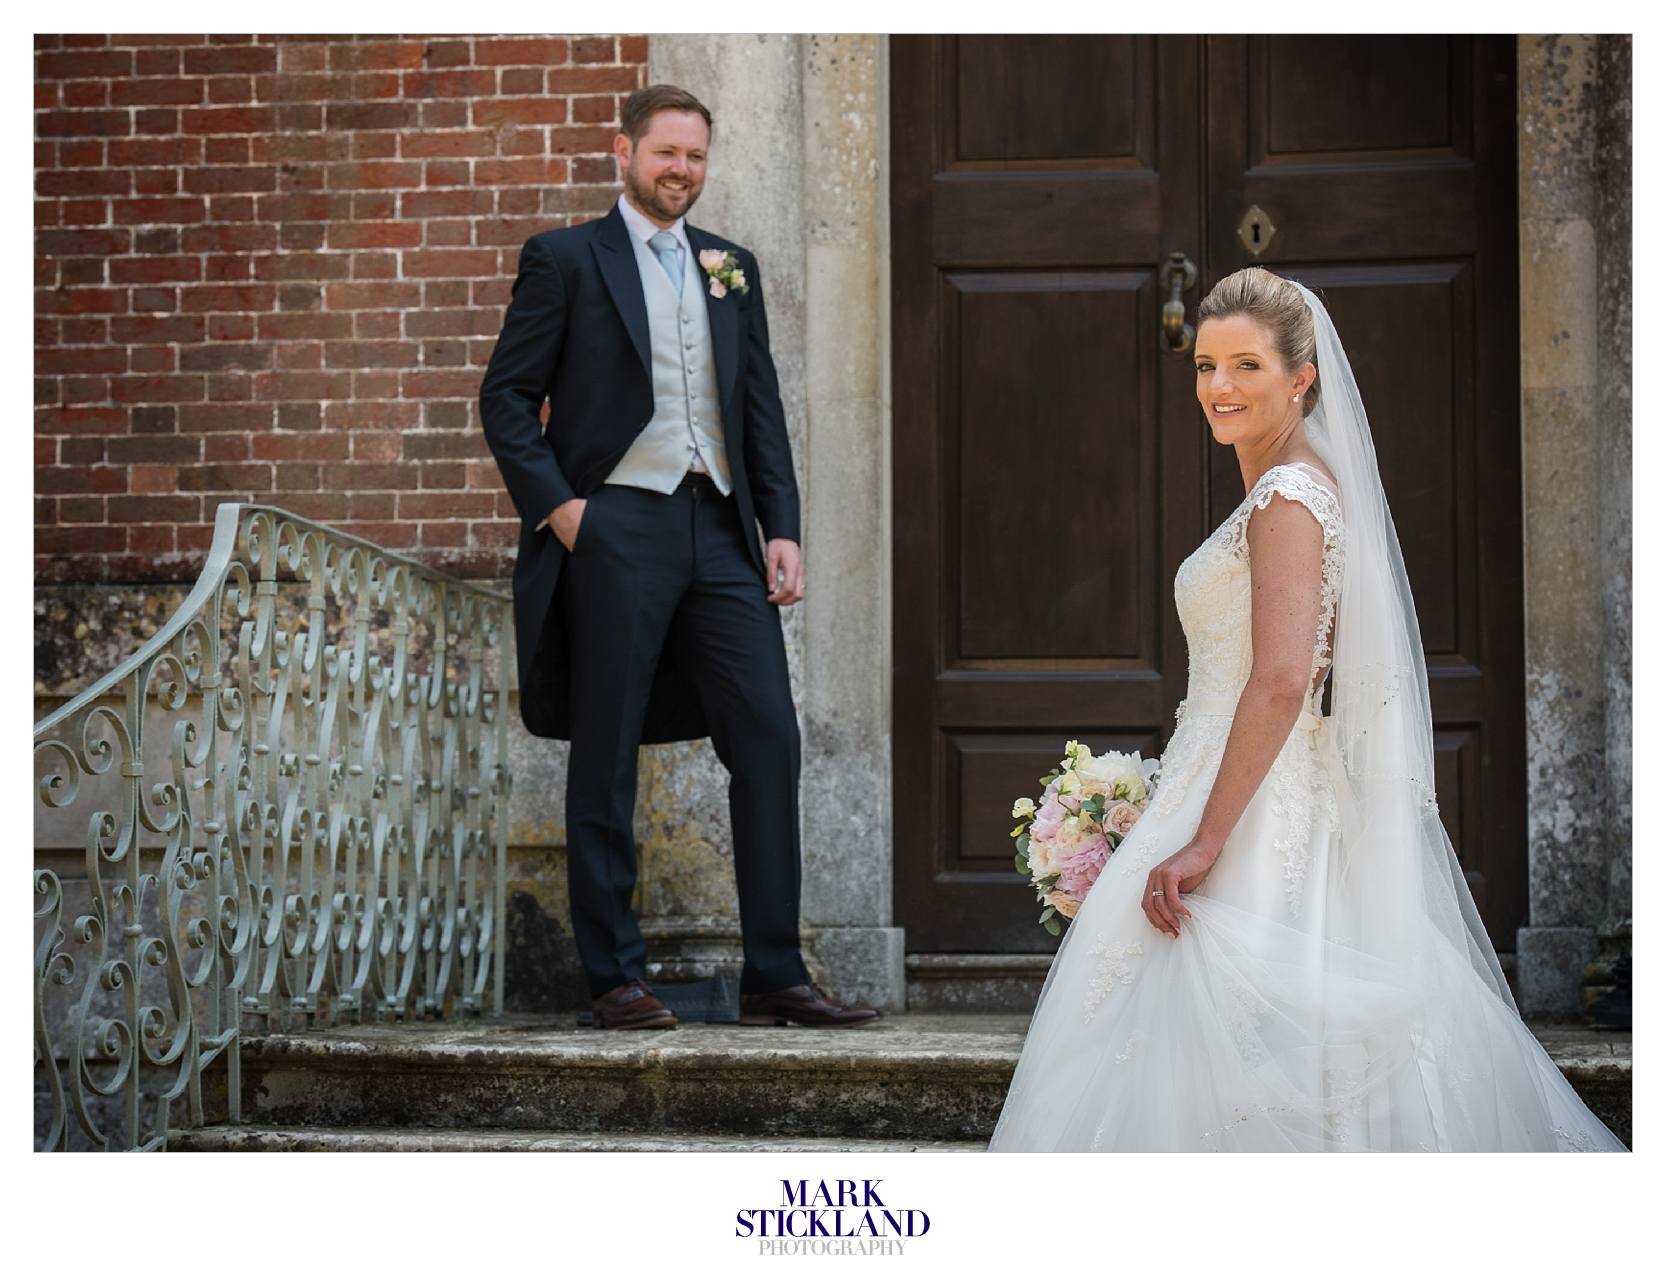 024.deans_court_wedding_wimborne_dorset